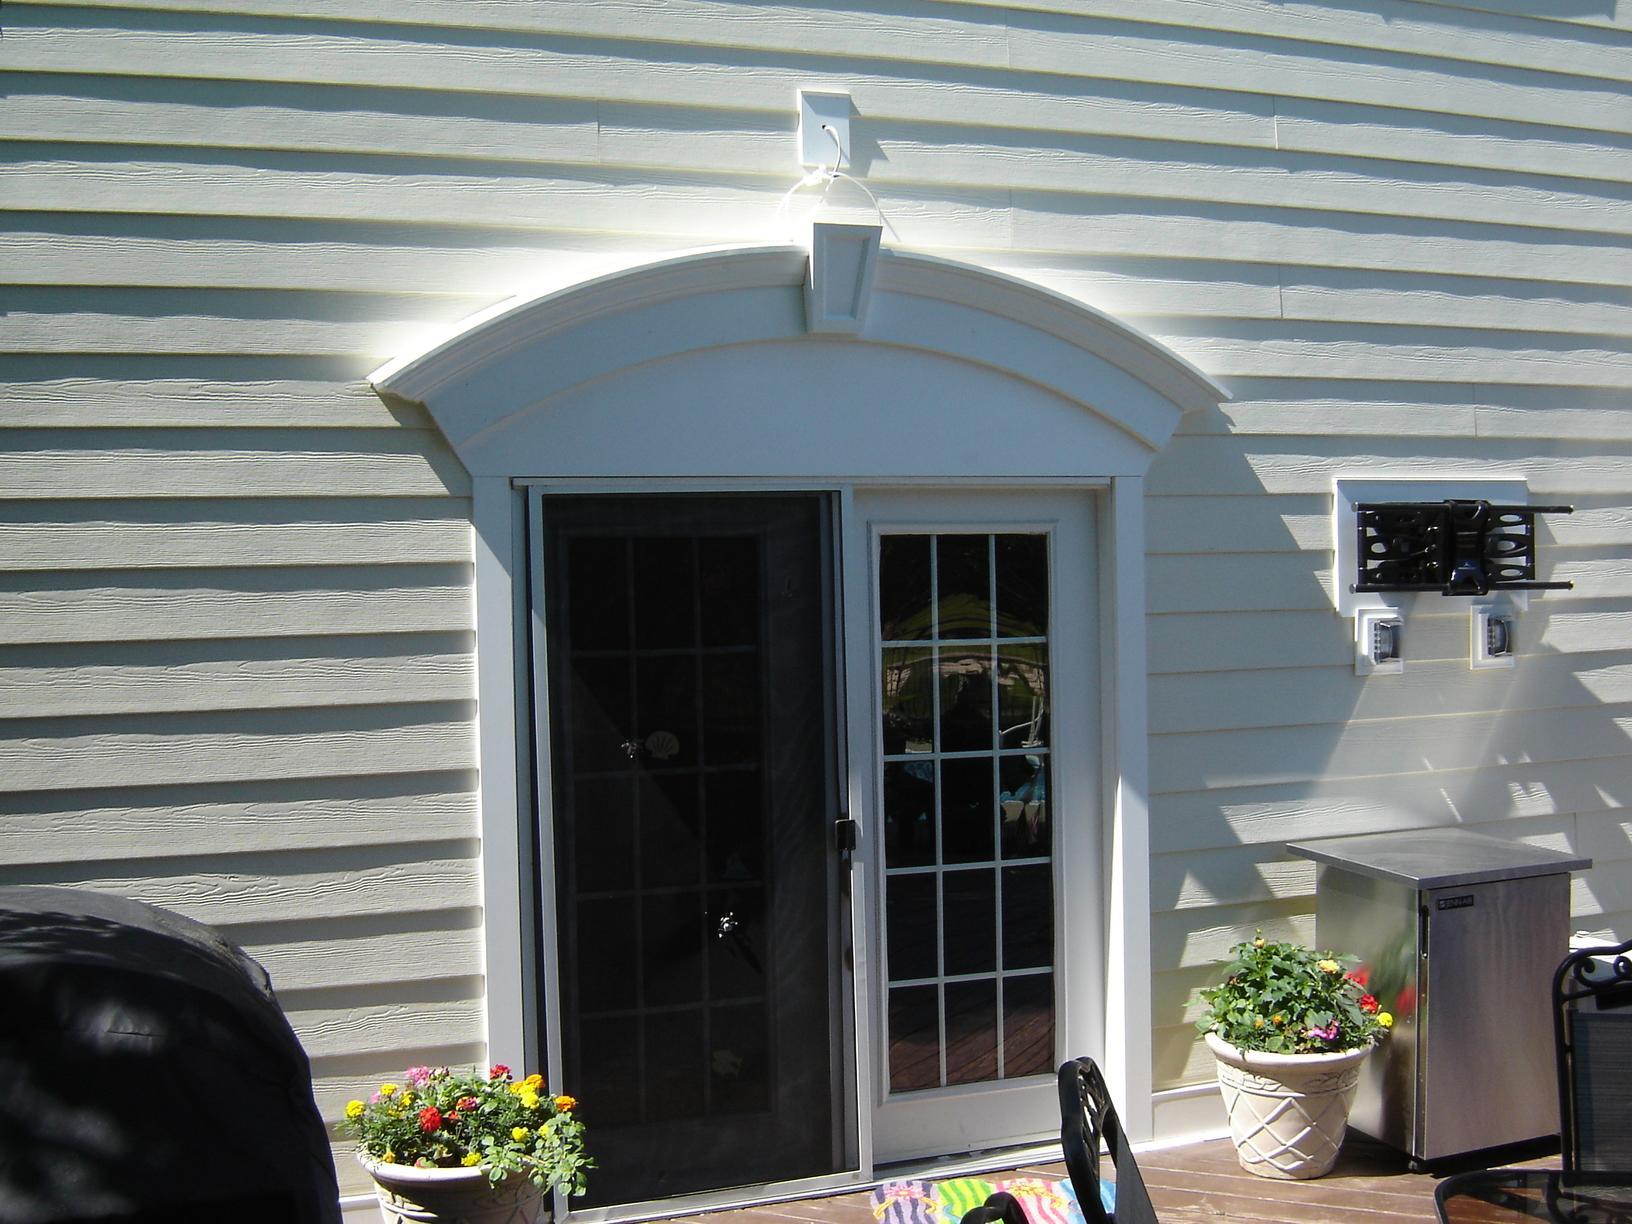 Remodeling Patio Door and Space